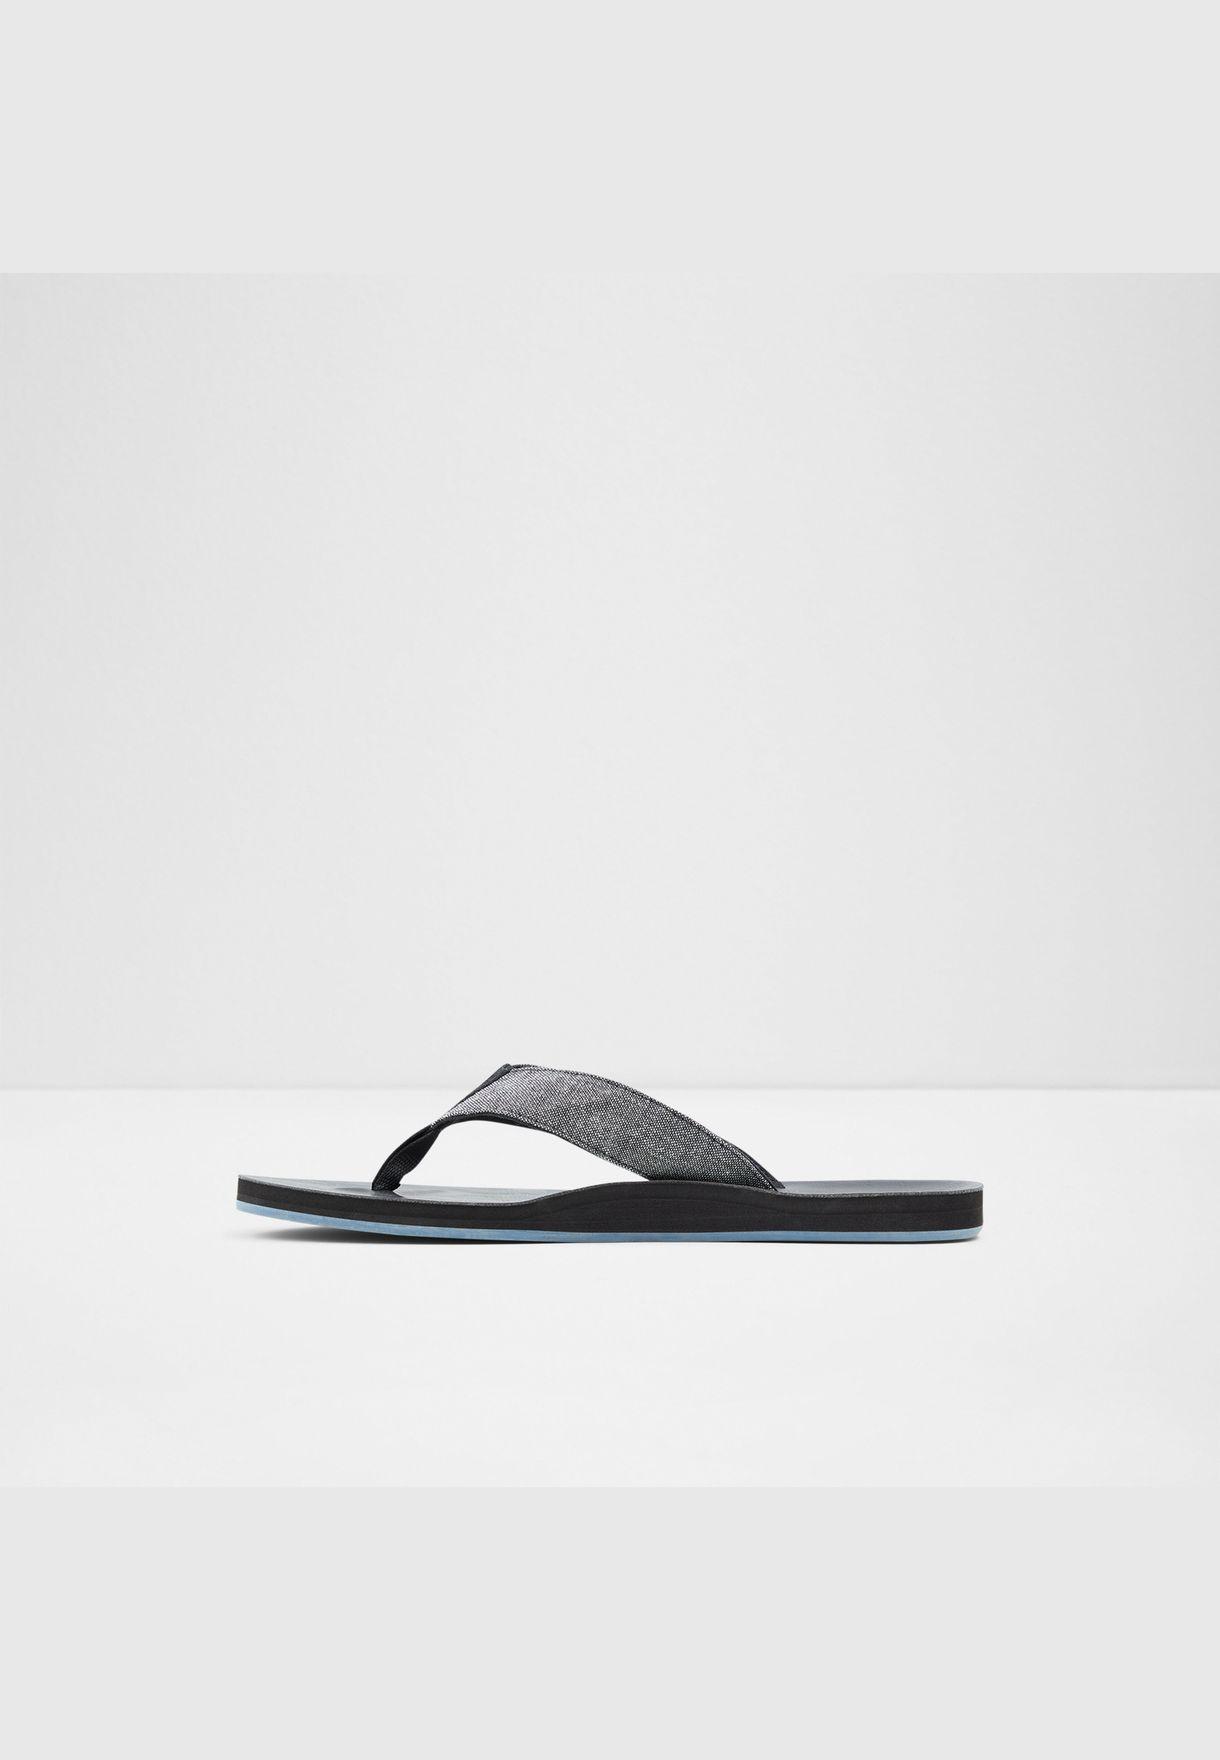 Fabric Sandal Flat Heel